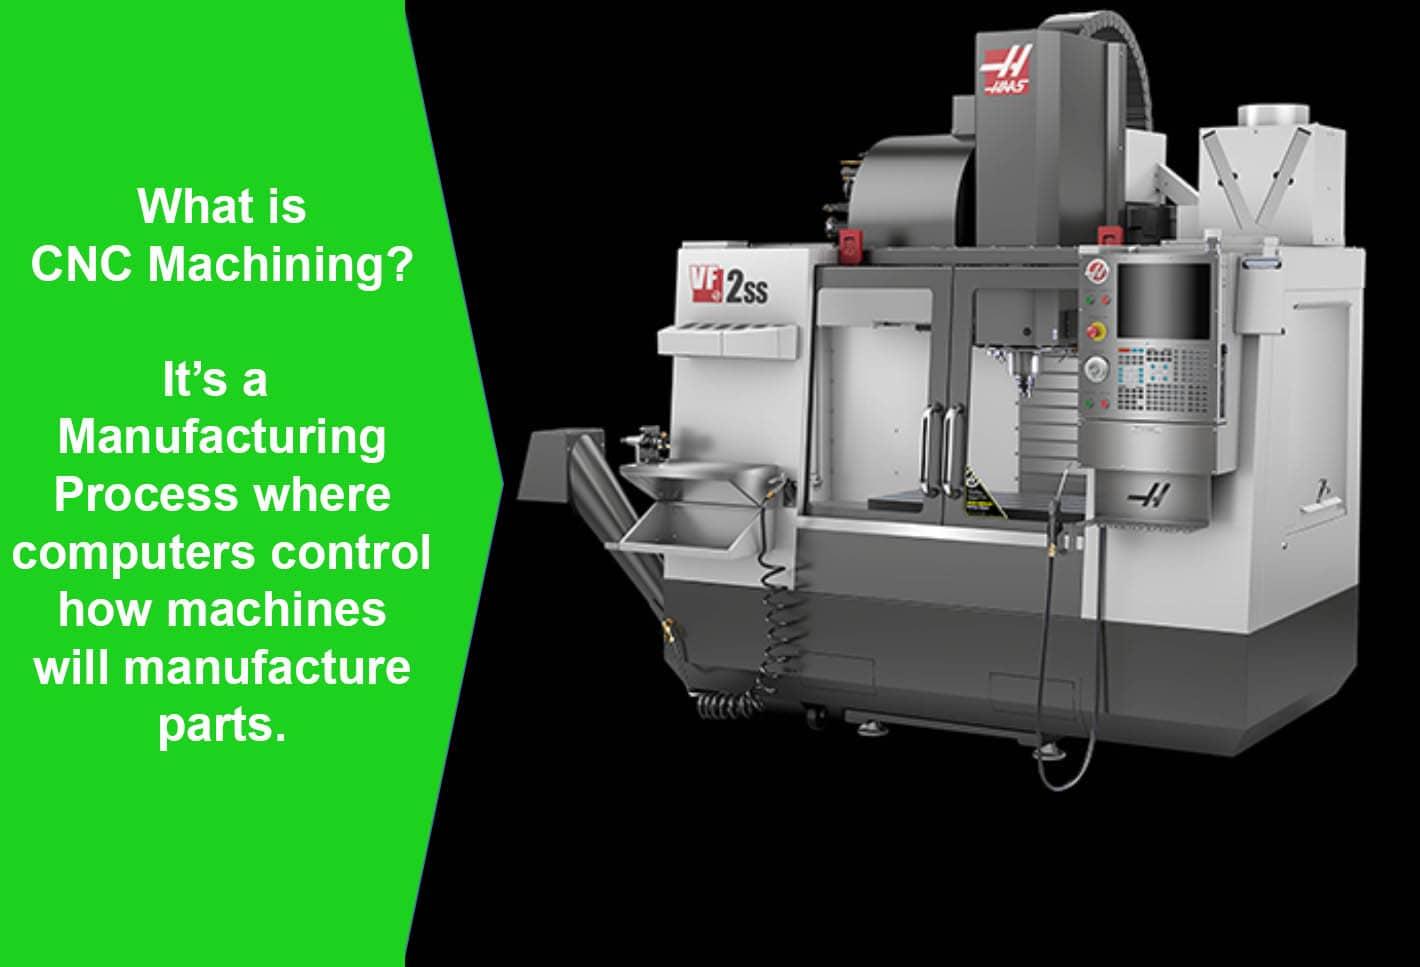 What Does Cnc Stand For >> What Does CNC Stand For? What Is a CNC Machine?